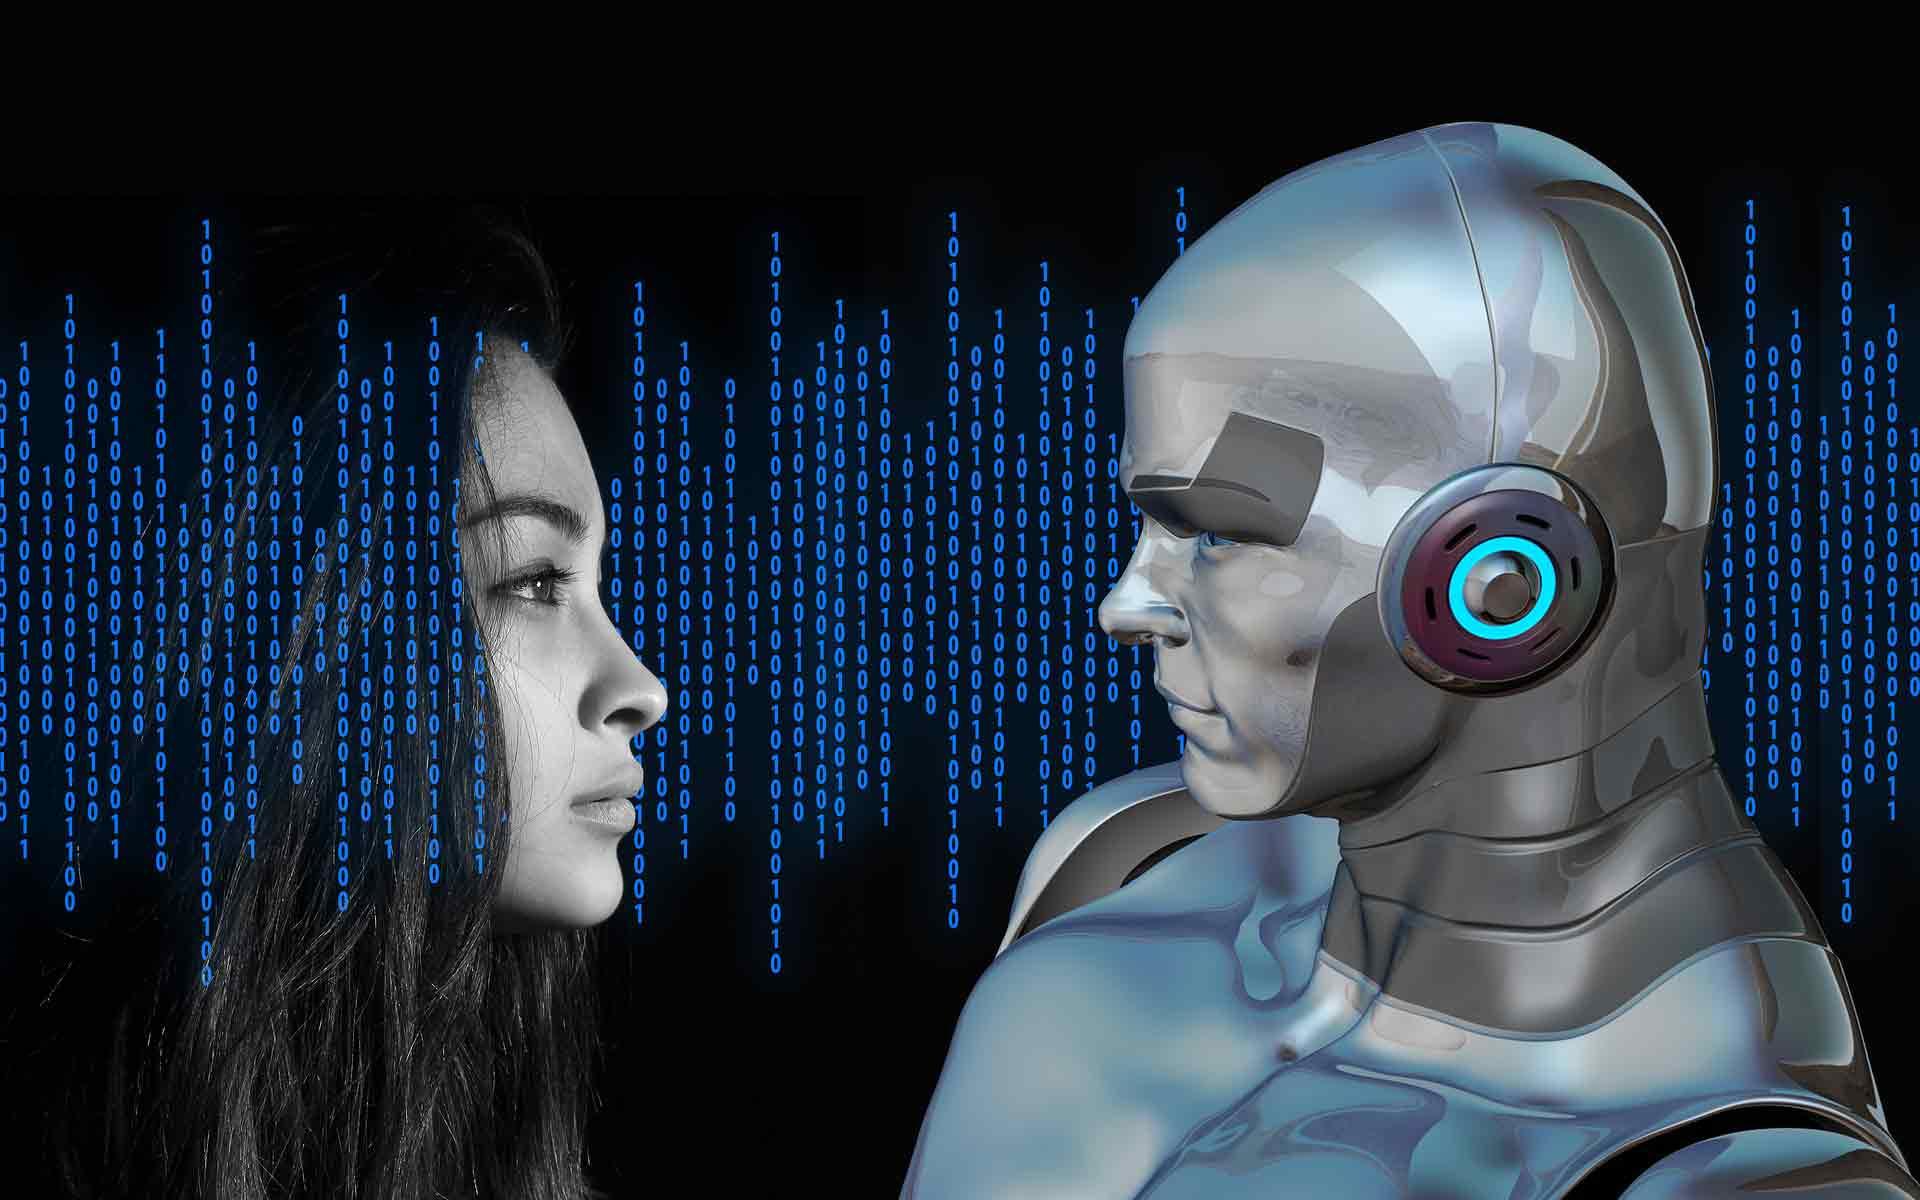 Artificial Intelligence AI robots